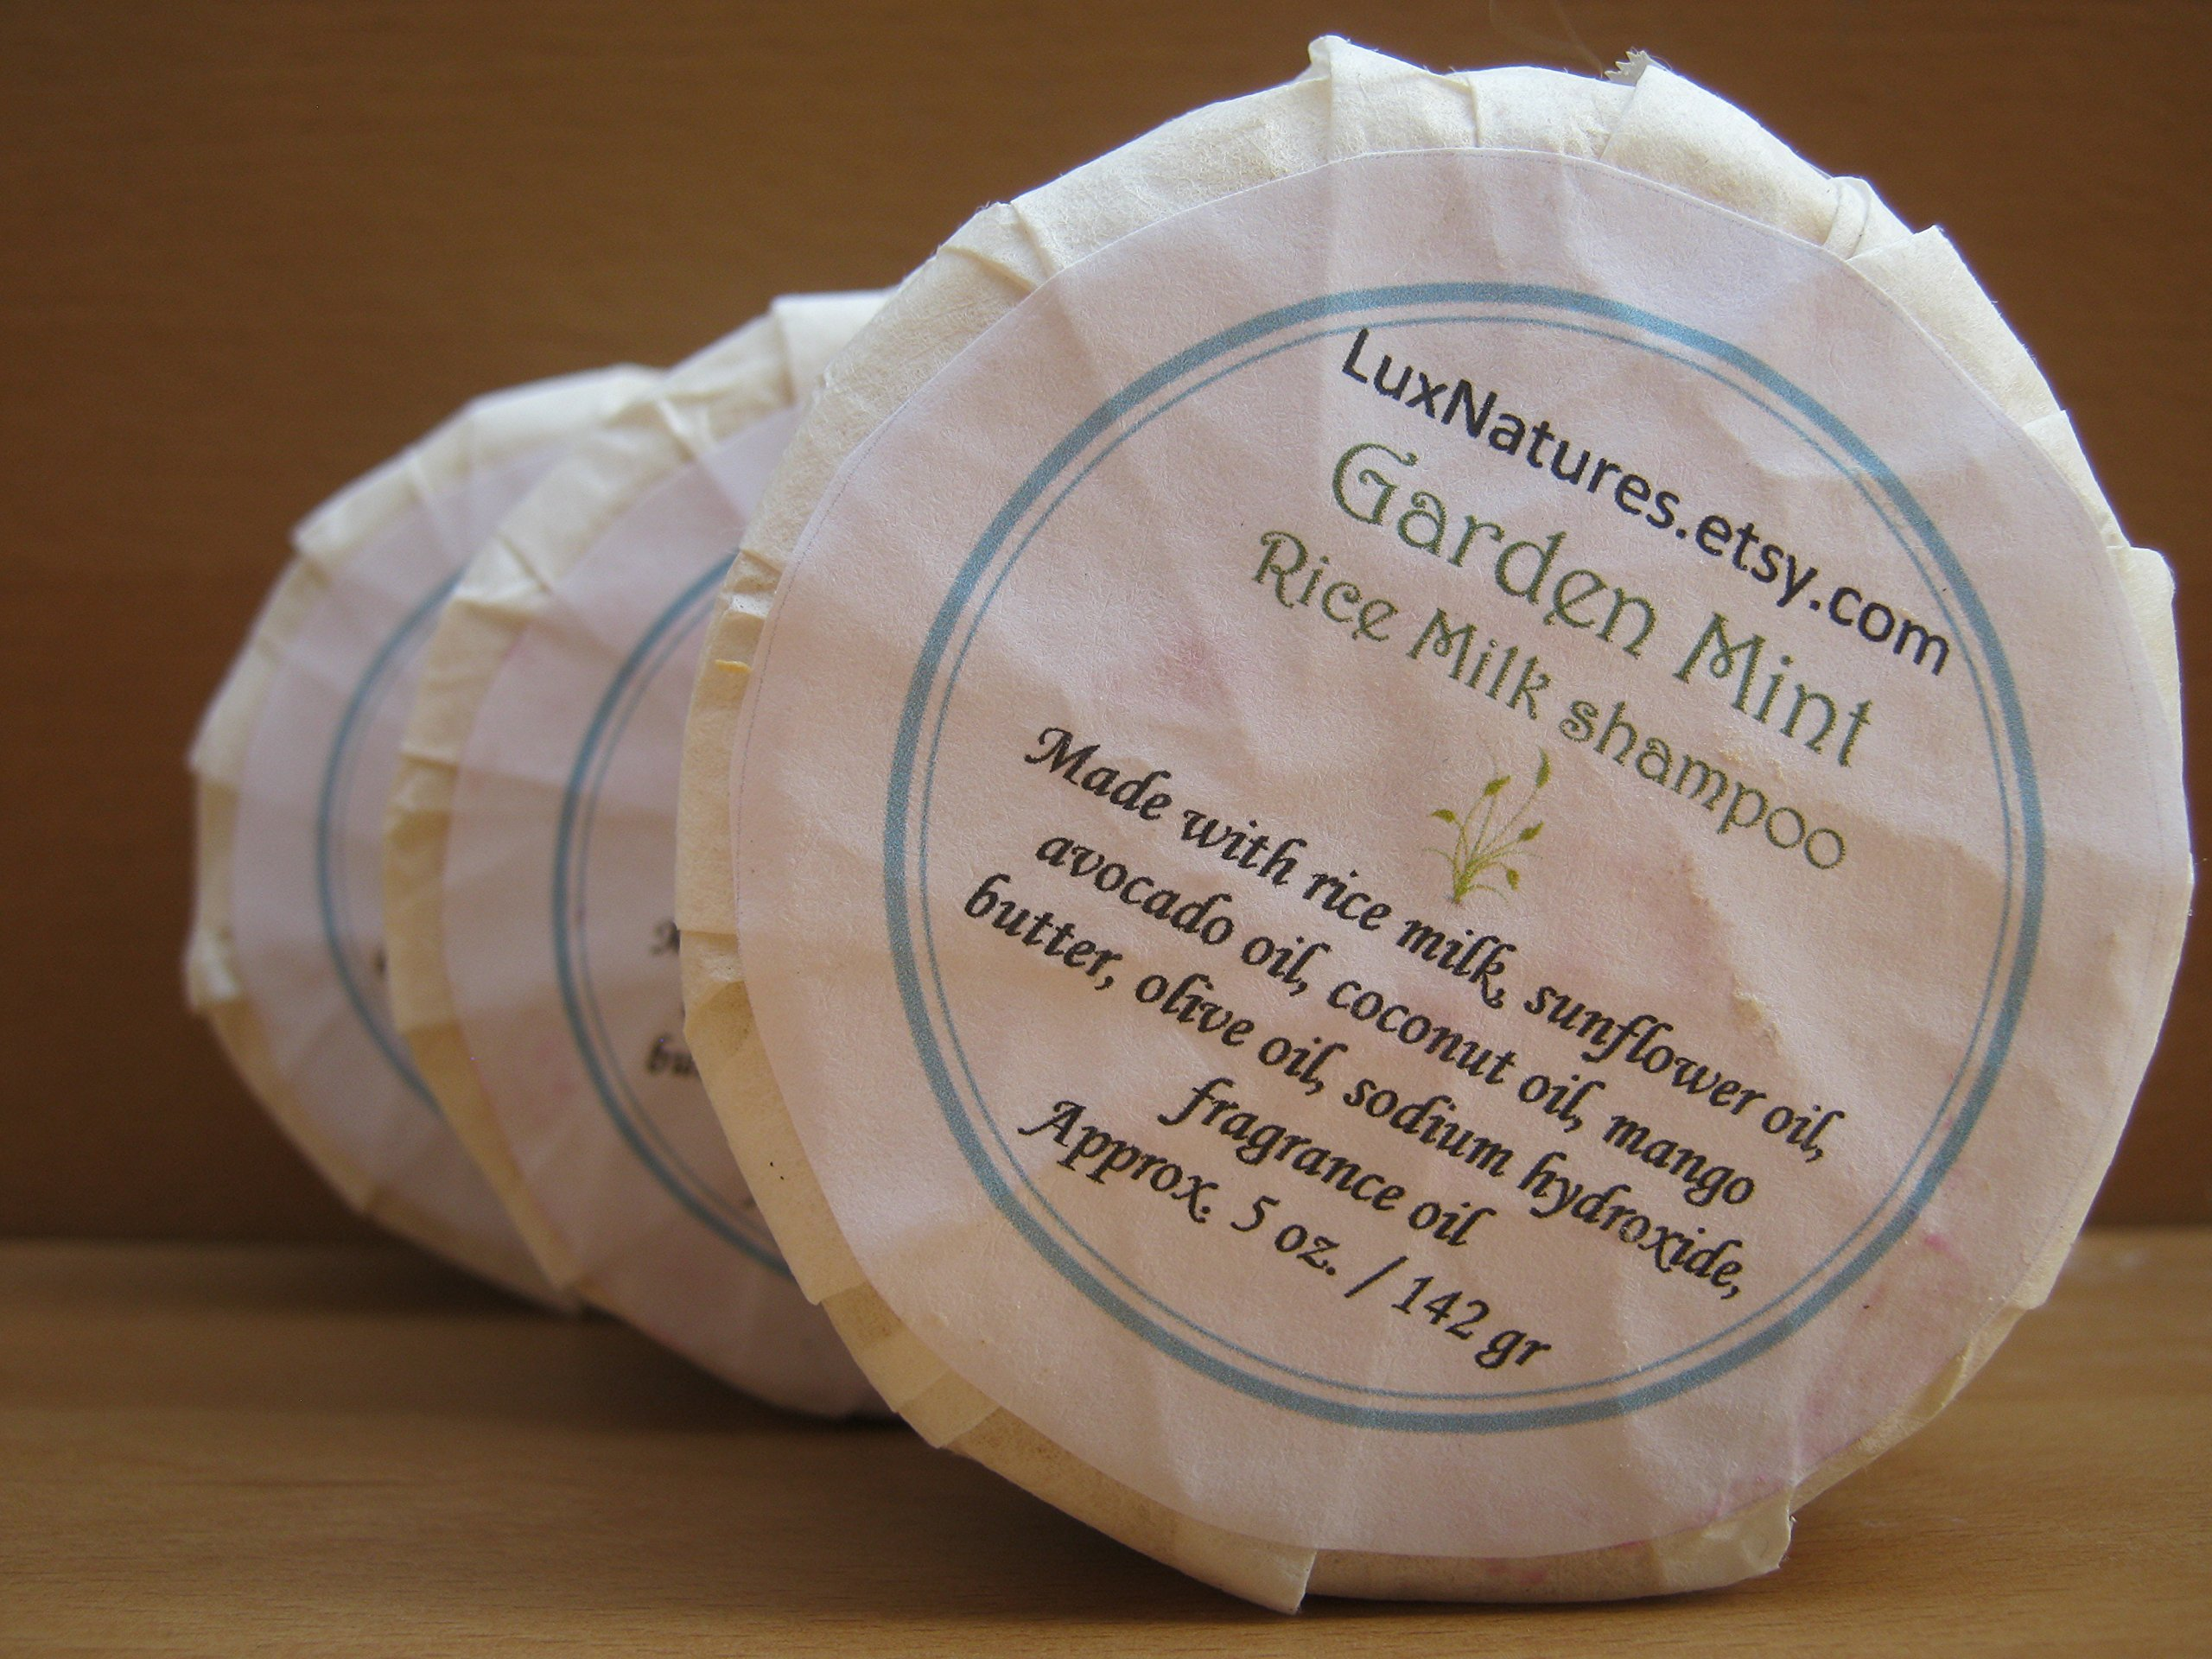 50 Wholesale Bulk lot Rice Milk natural hair shampoo soap bars by Lux Natures